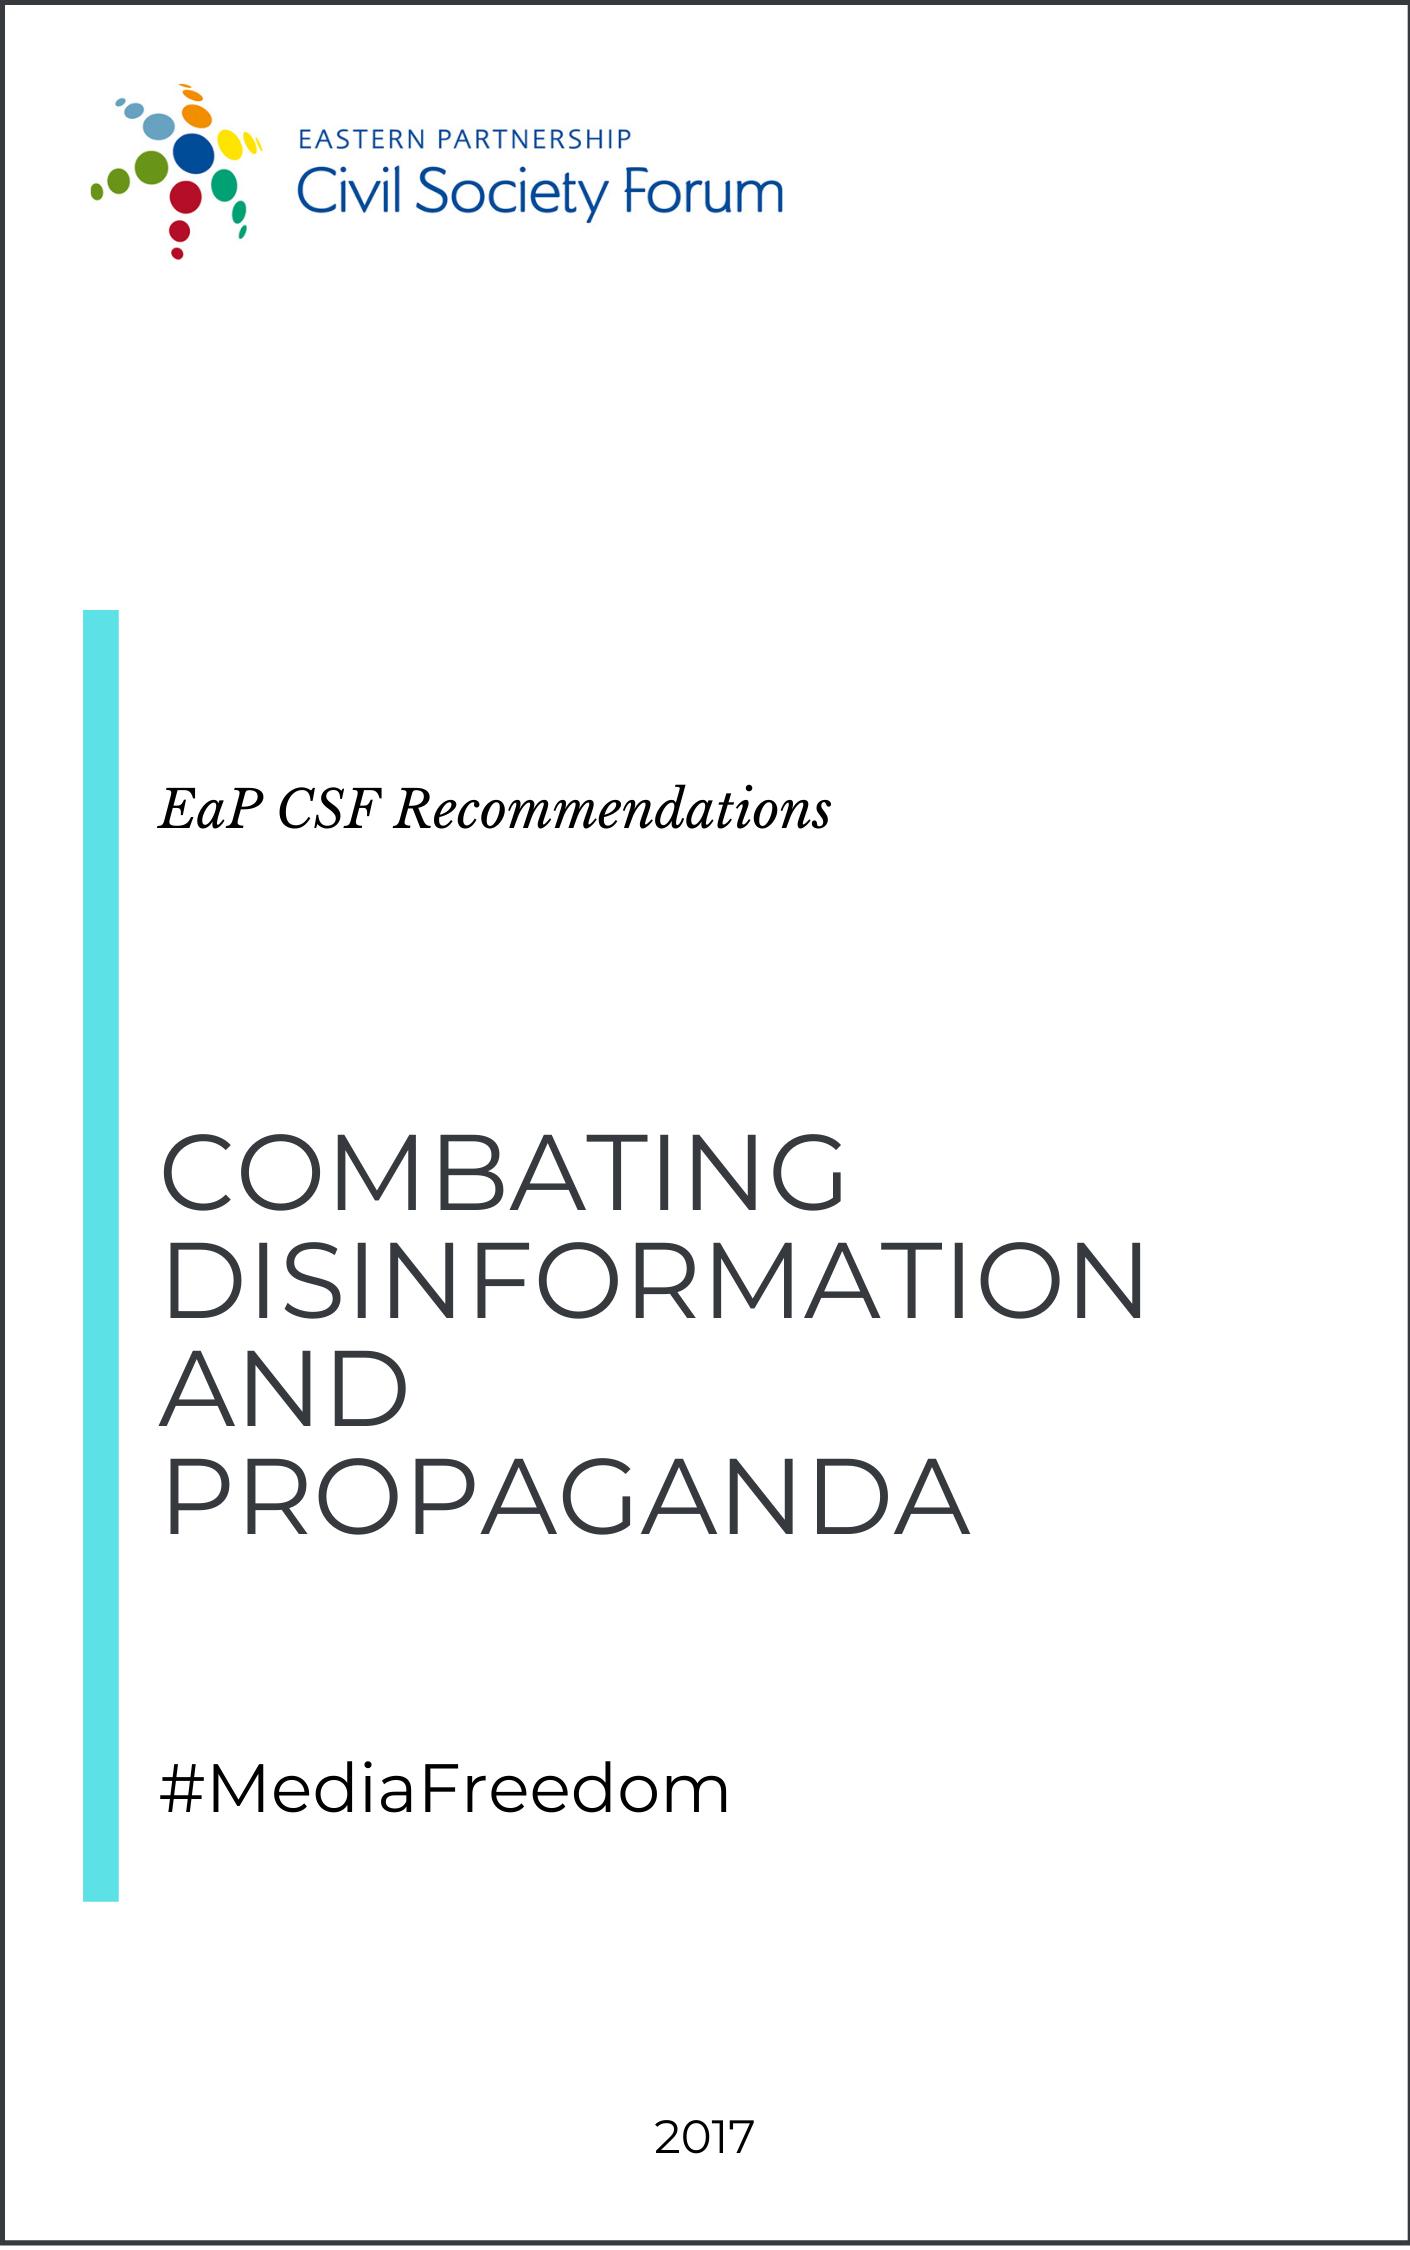 Combating Disinformation and Propaganda